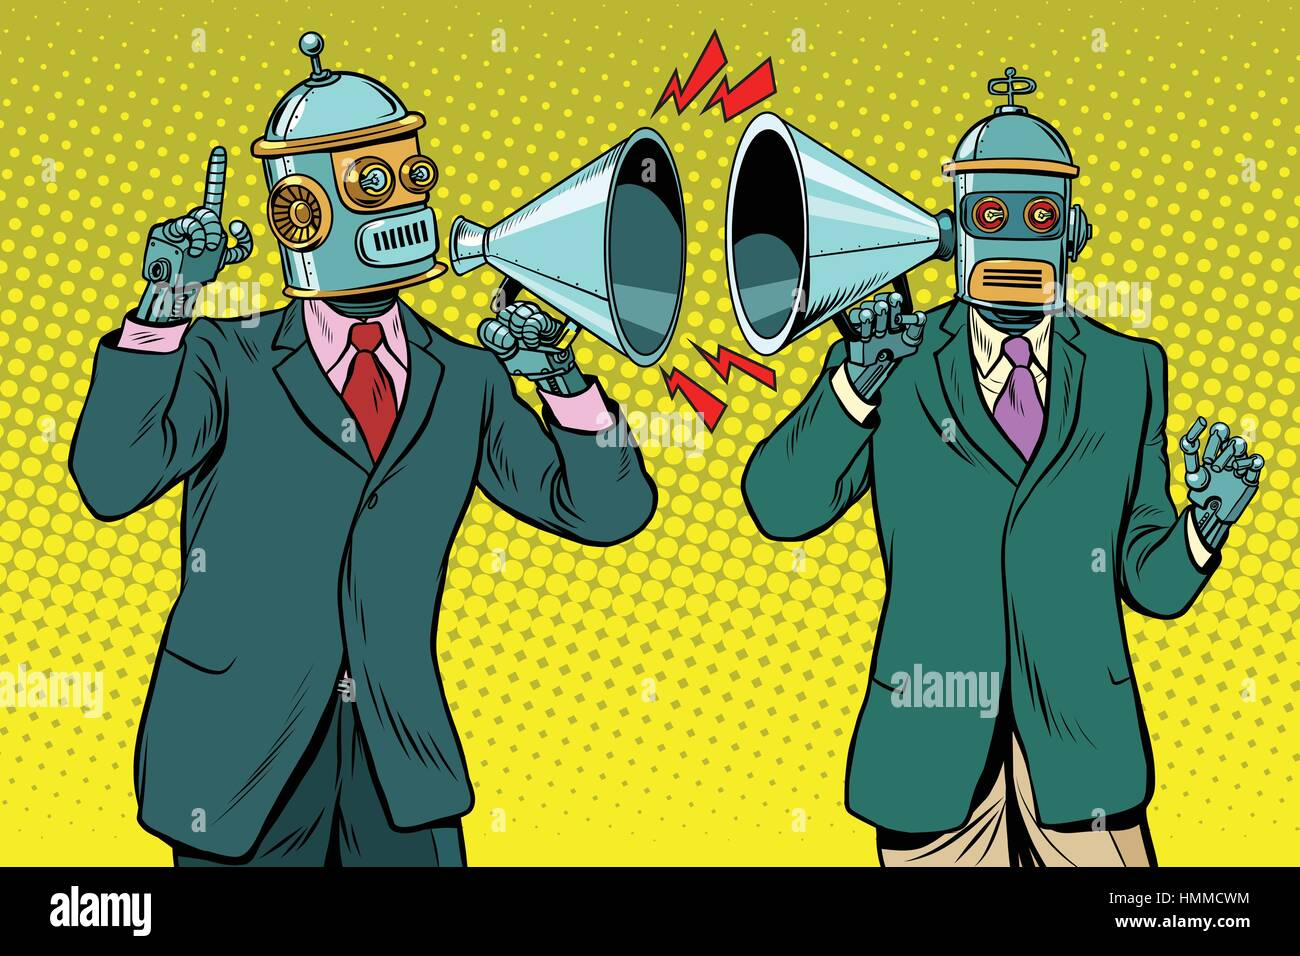 Vintage a dialogue between two robots - Stock Vector